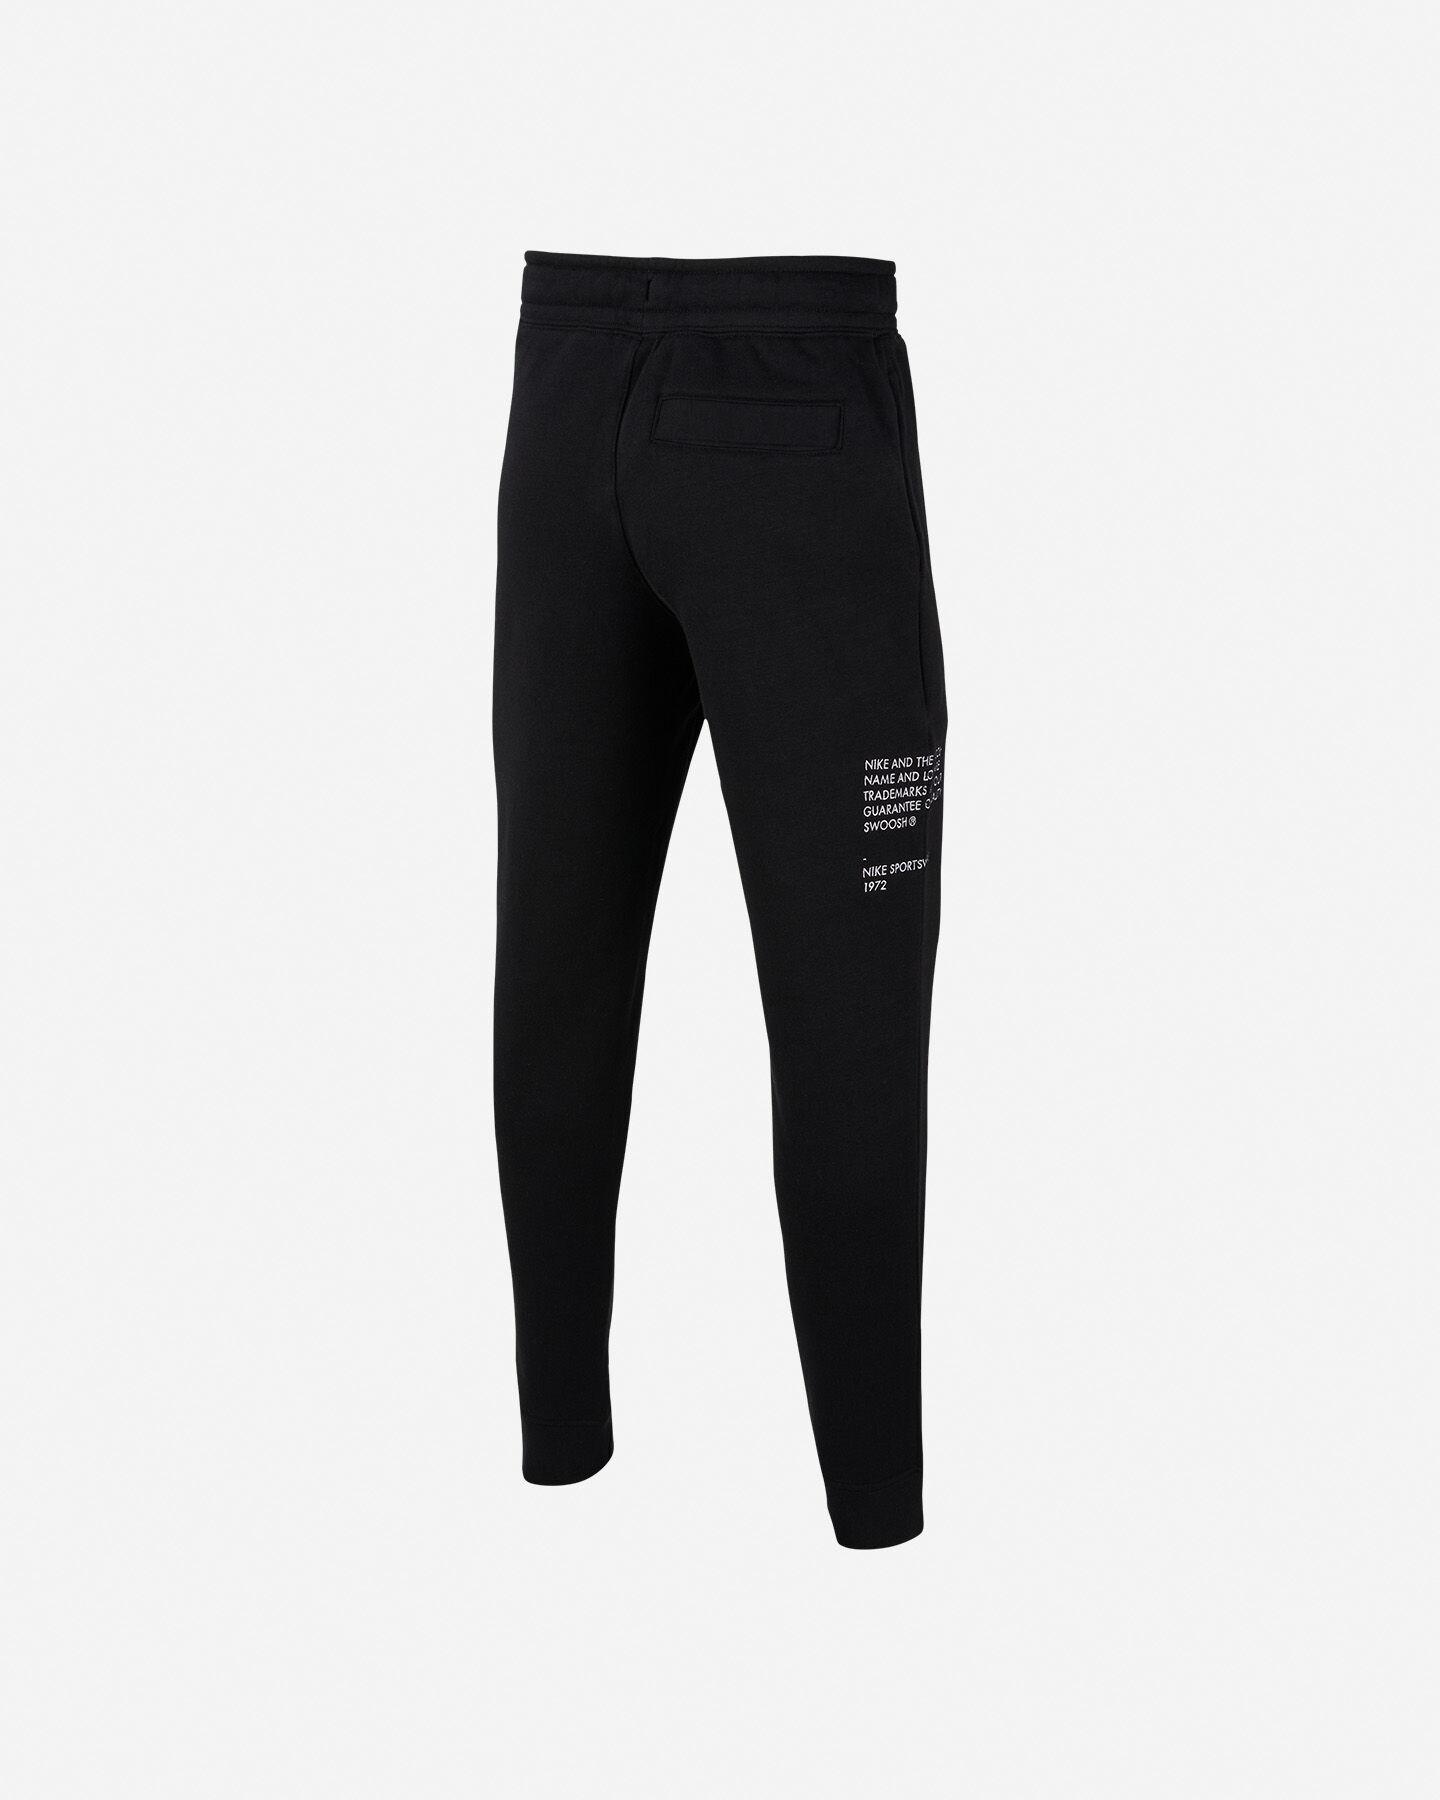 Pantalone NIKE SWOOSH JR S5225751 scatto 1